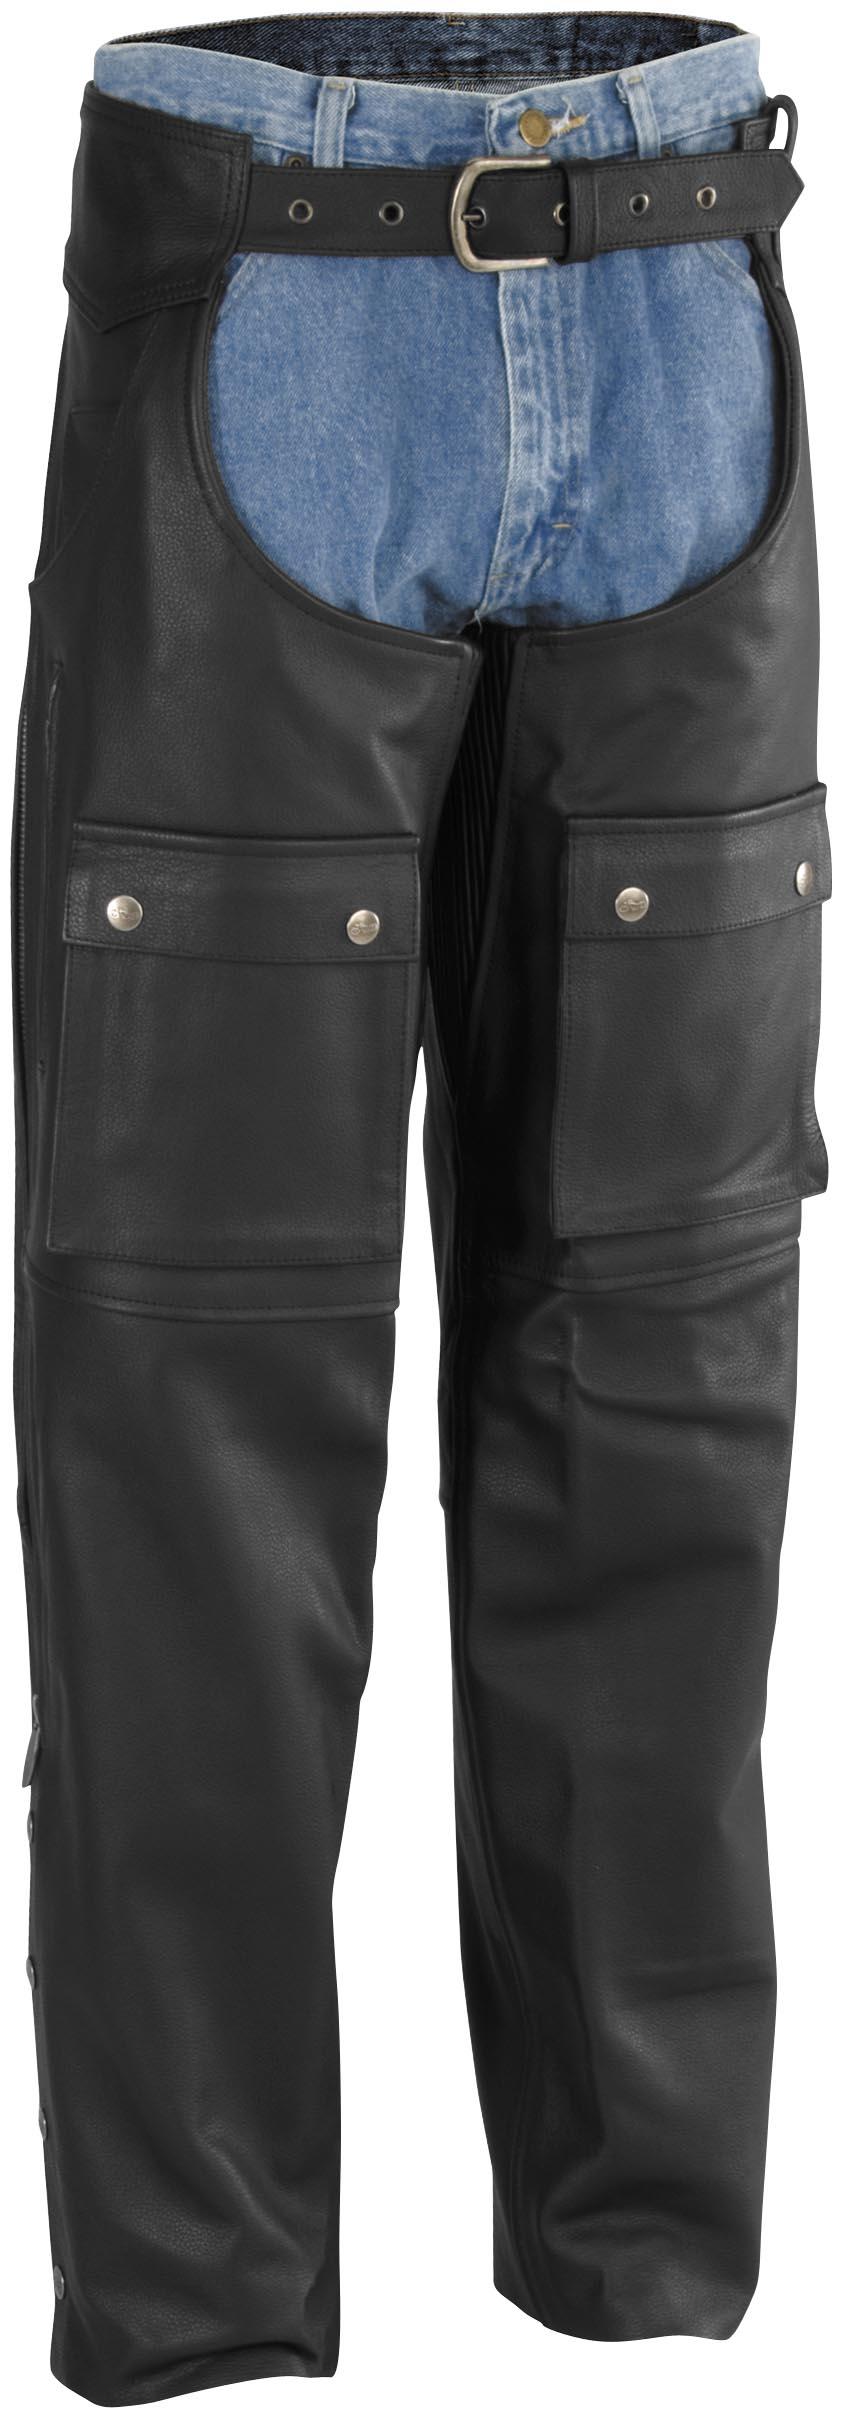 Moto Leather Chaps